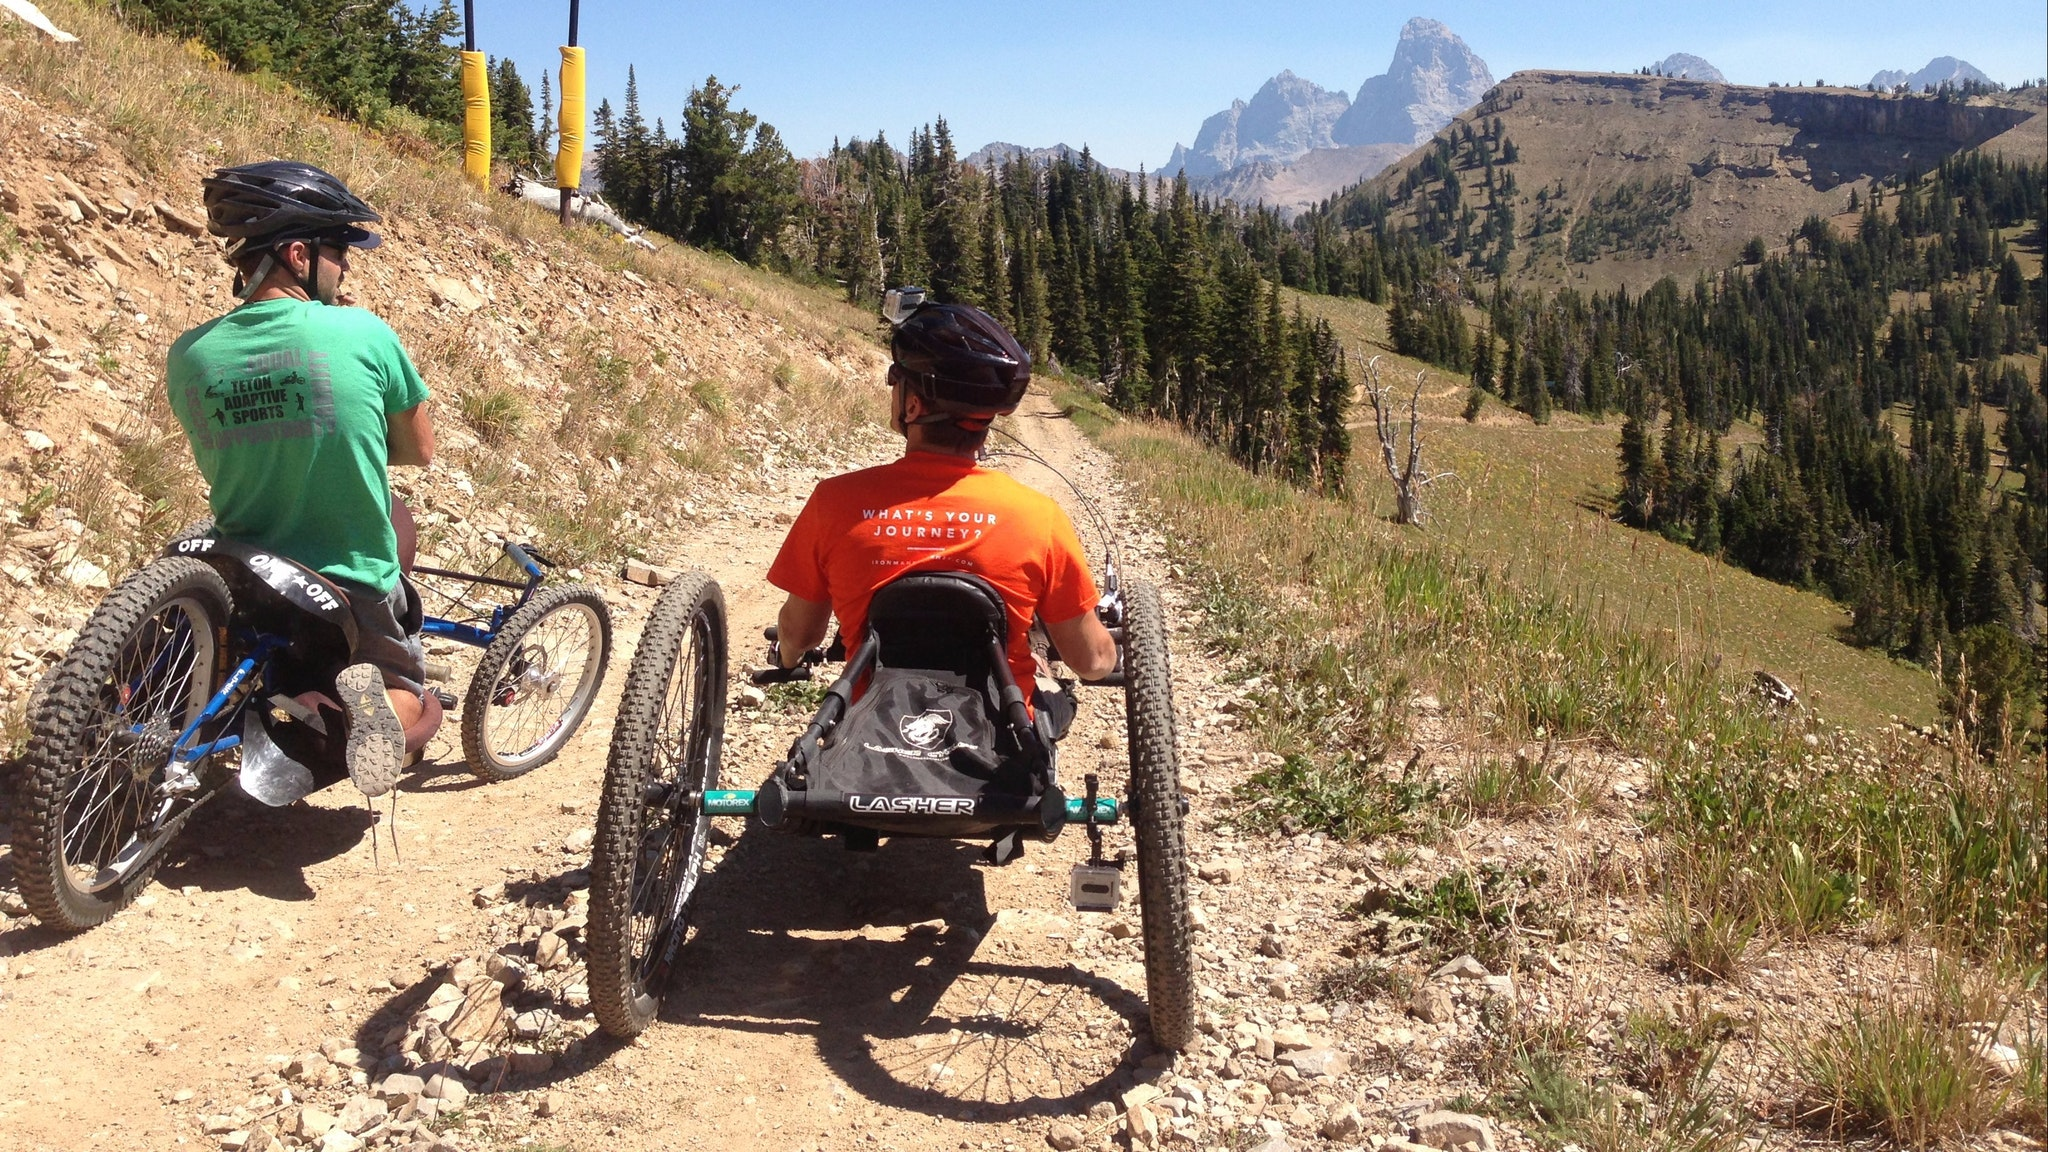 Mountain biking adaptive falls creek conference race dirt bike